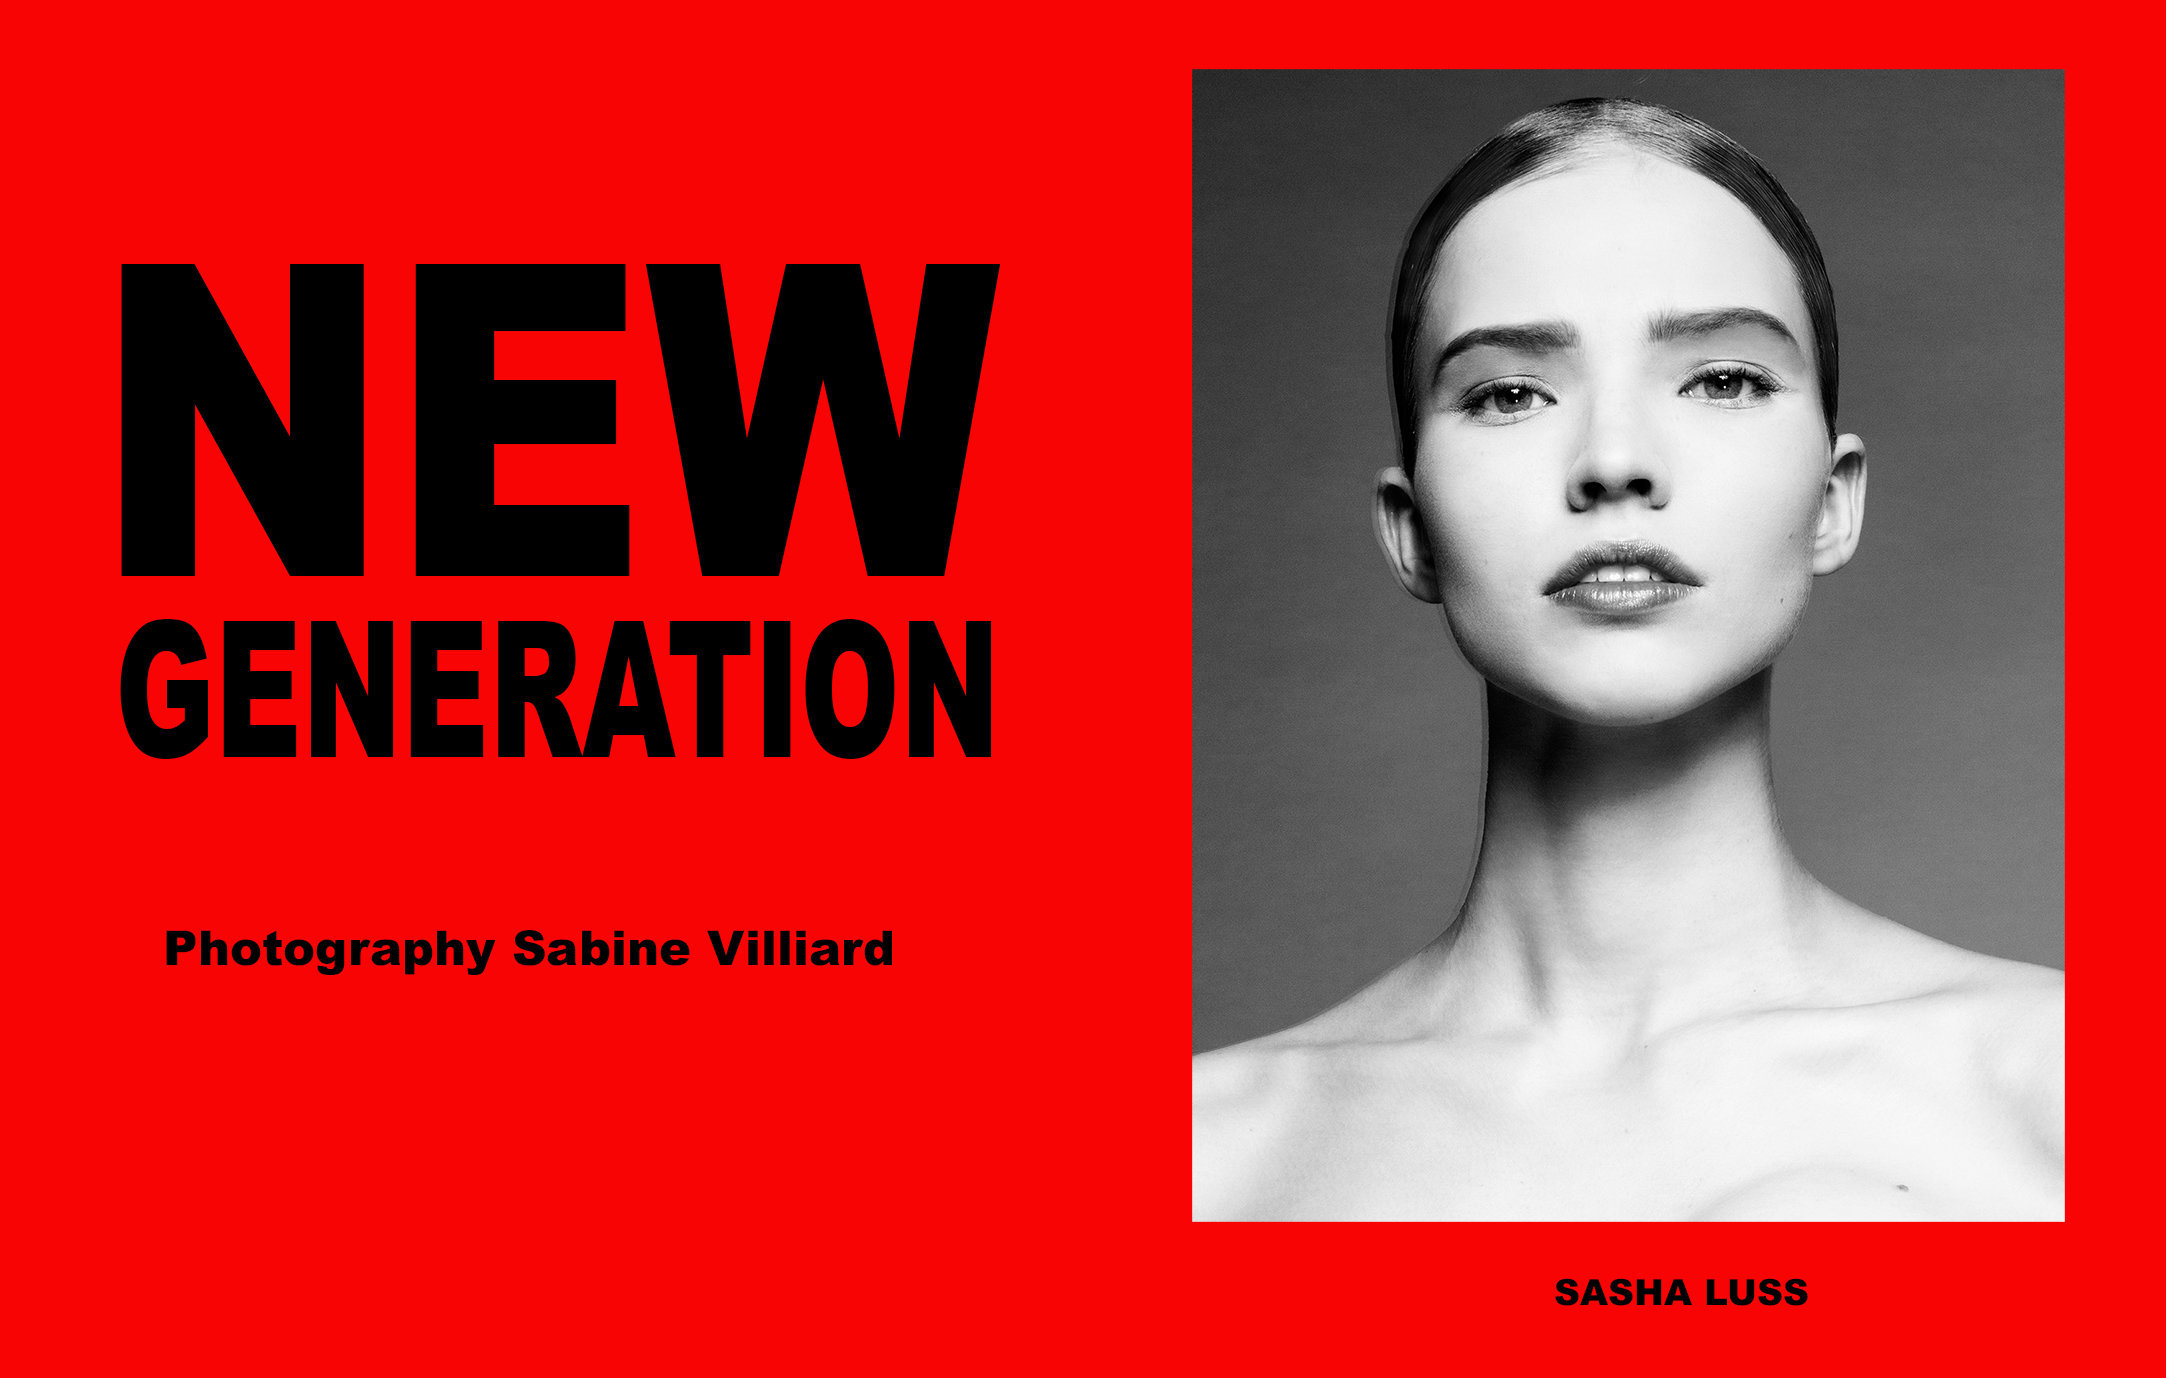 SABINE VILLIARD-NEW GENERATION -02.jpg